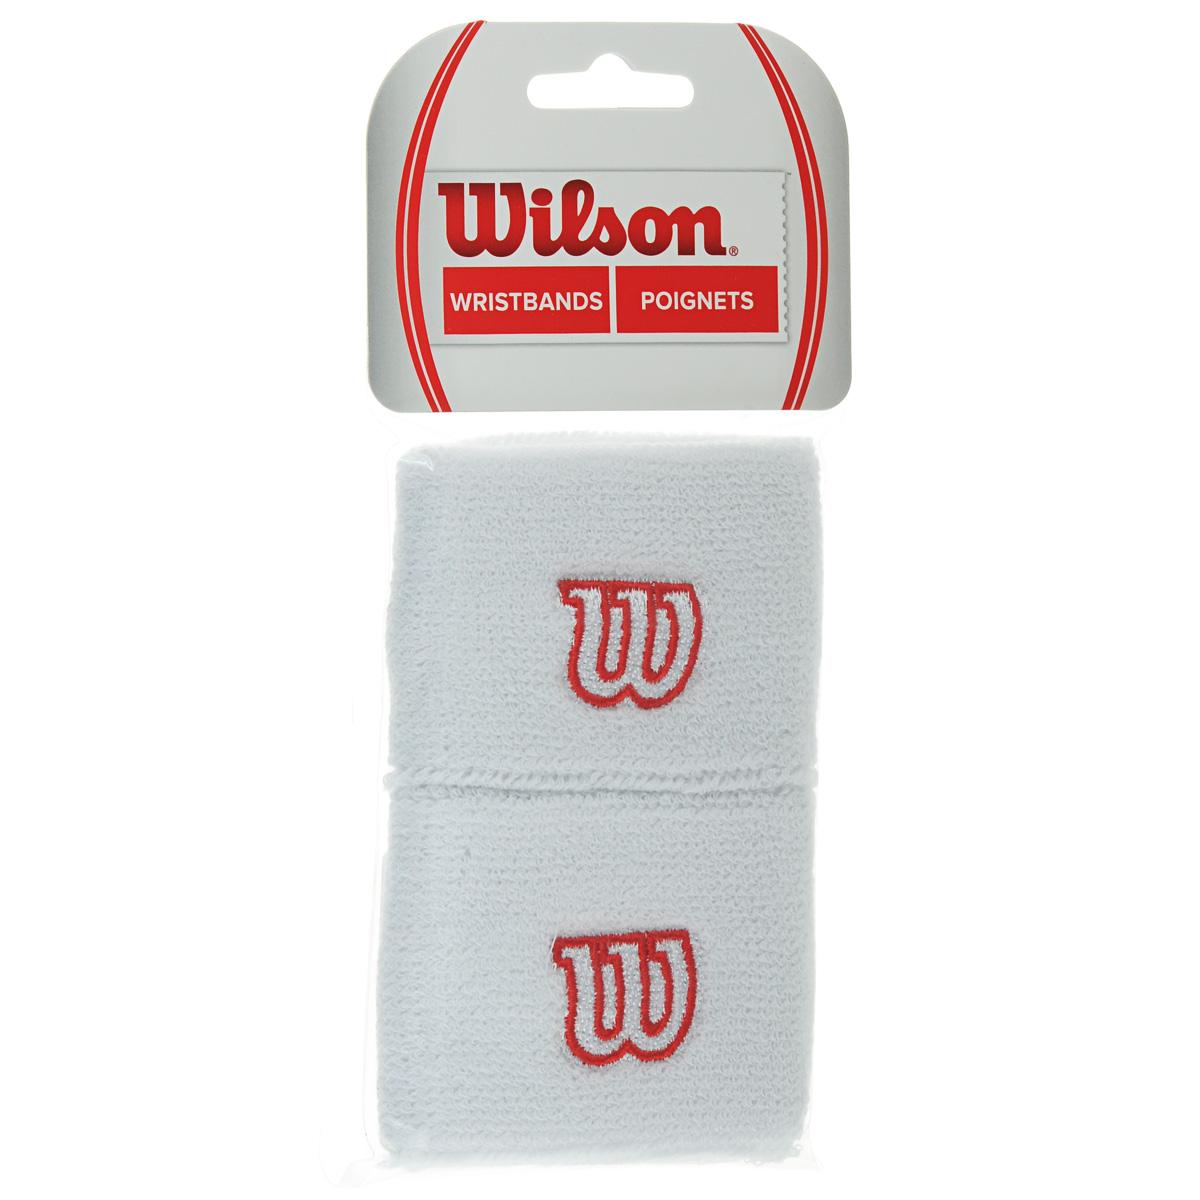 "Wilson Напульсник Wilson ""Wristband"", цвет: белый, 2 шт. Размер универсальный"